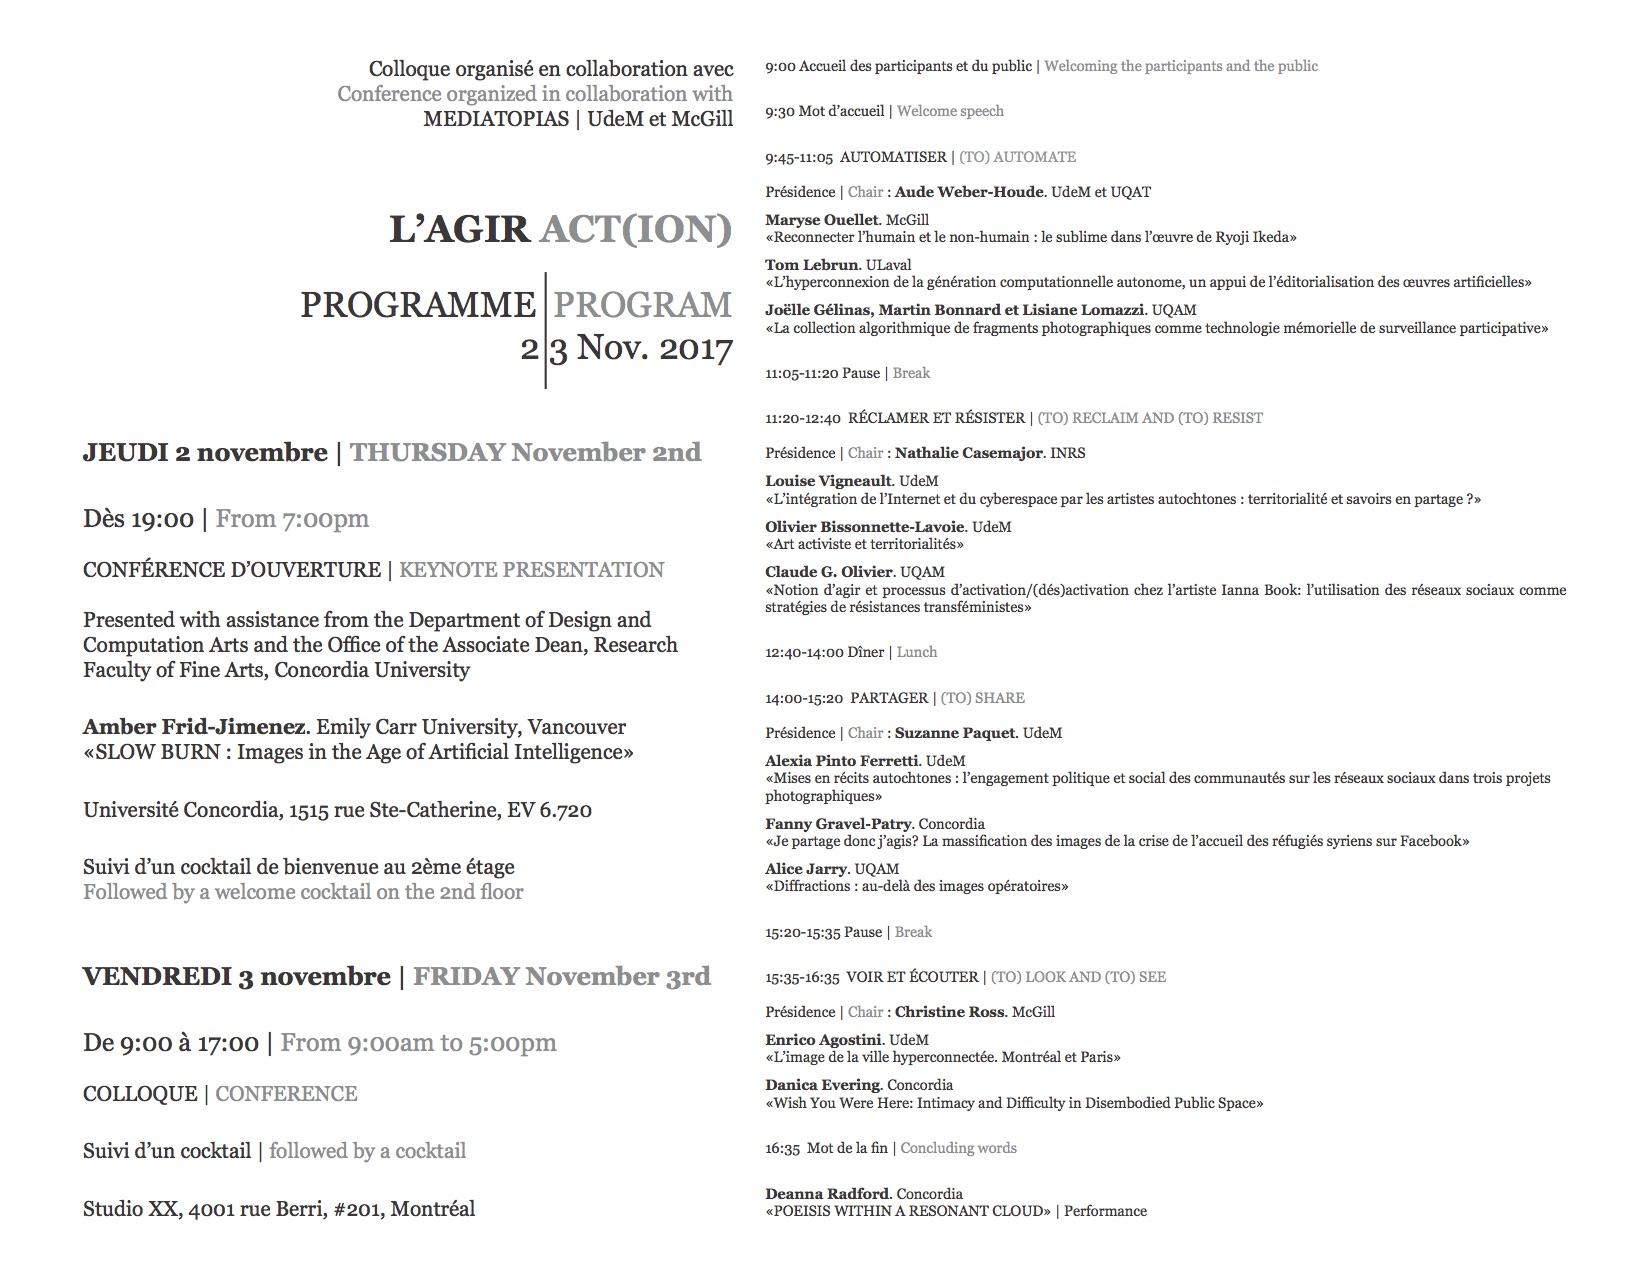 Programmediffusionpaysage JPEG.jpg